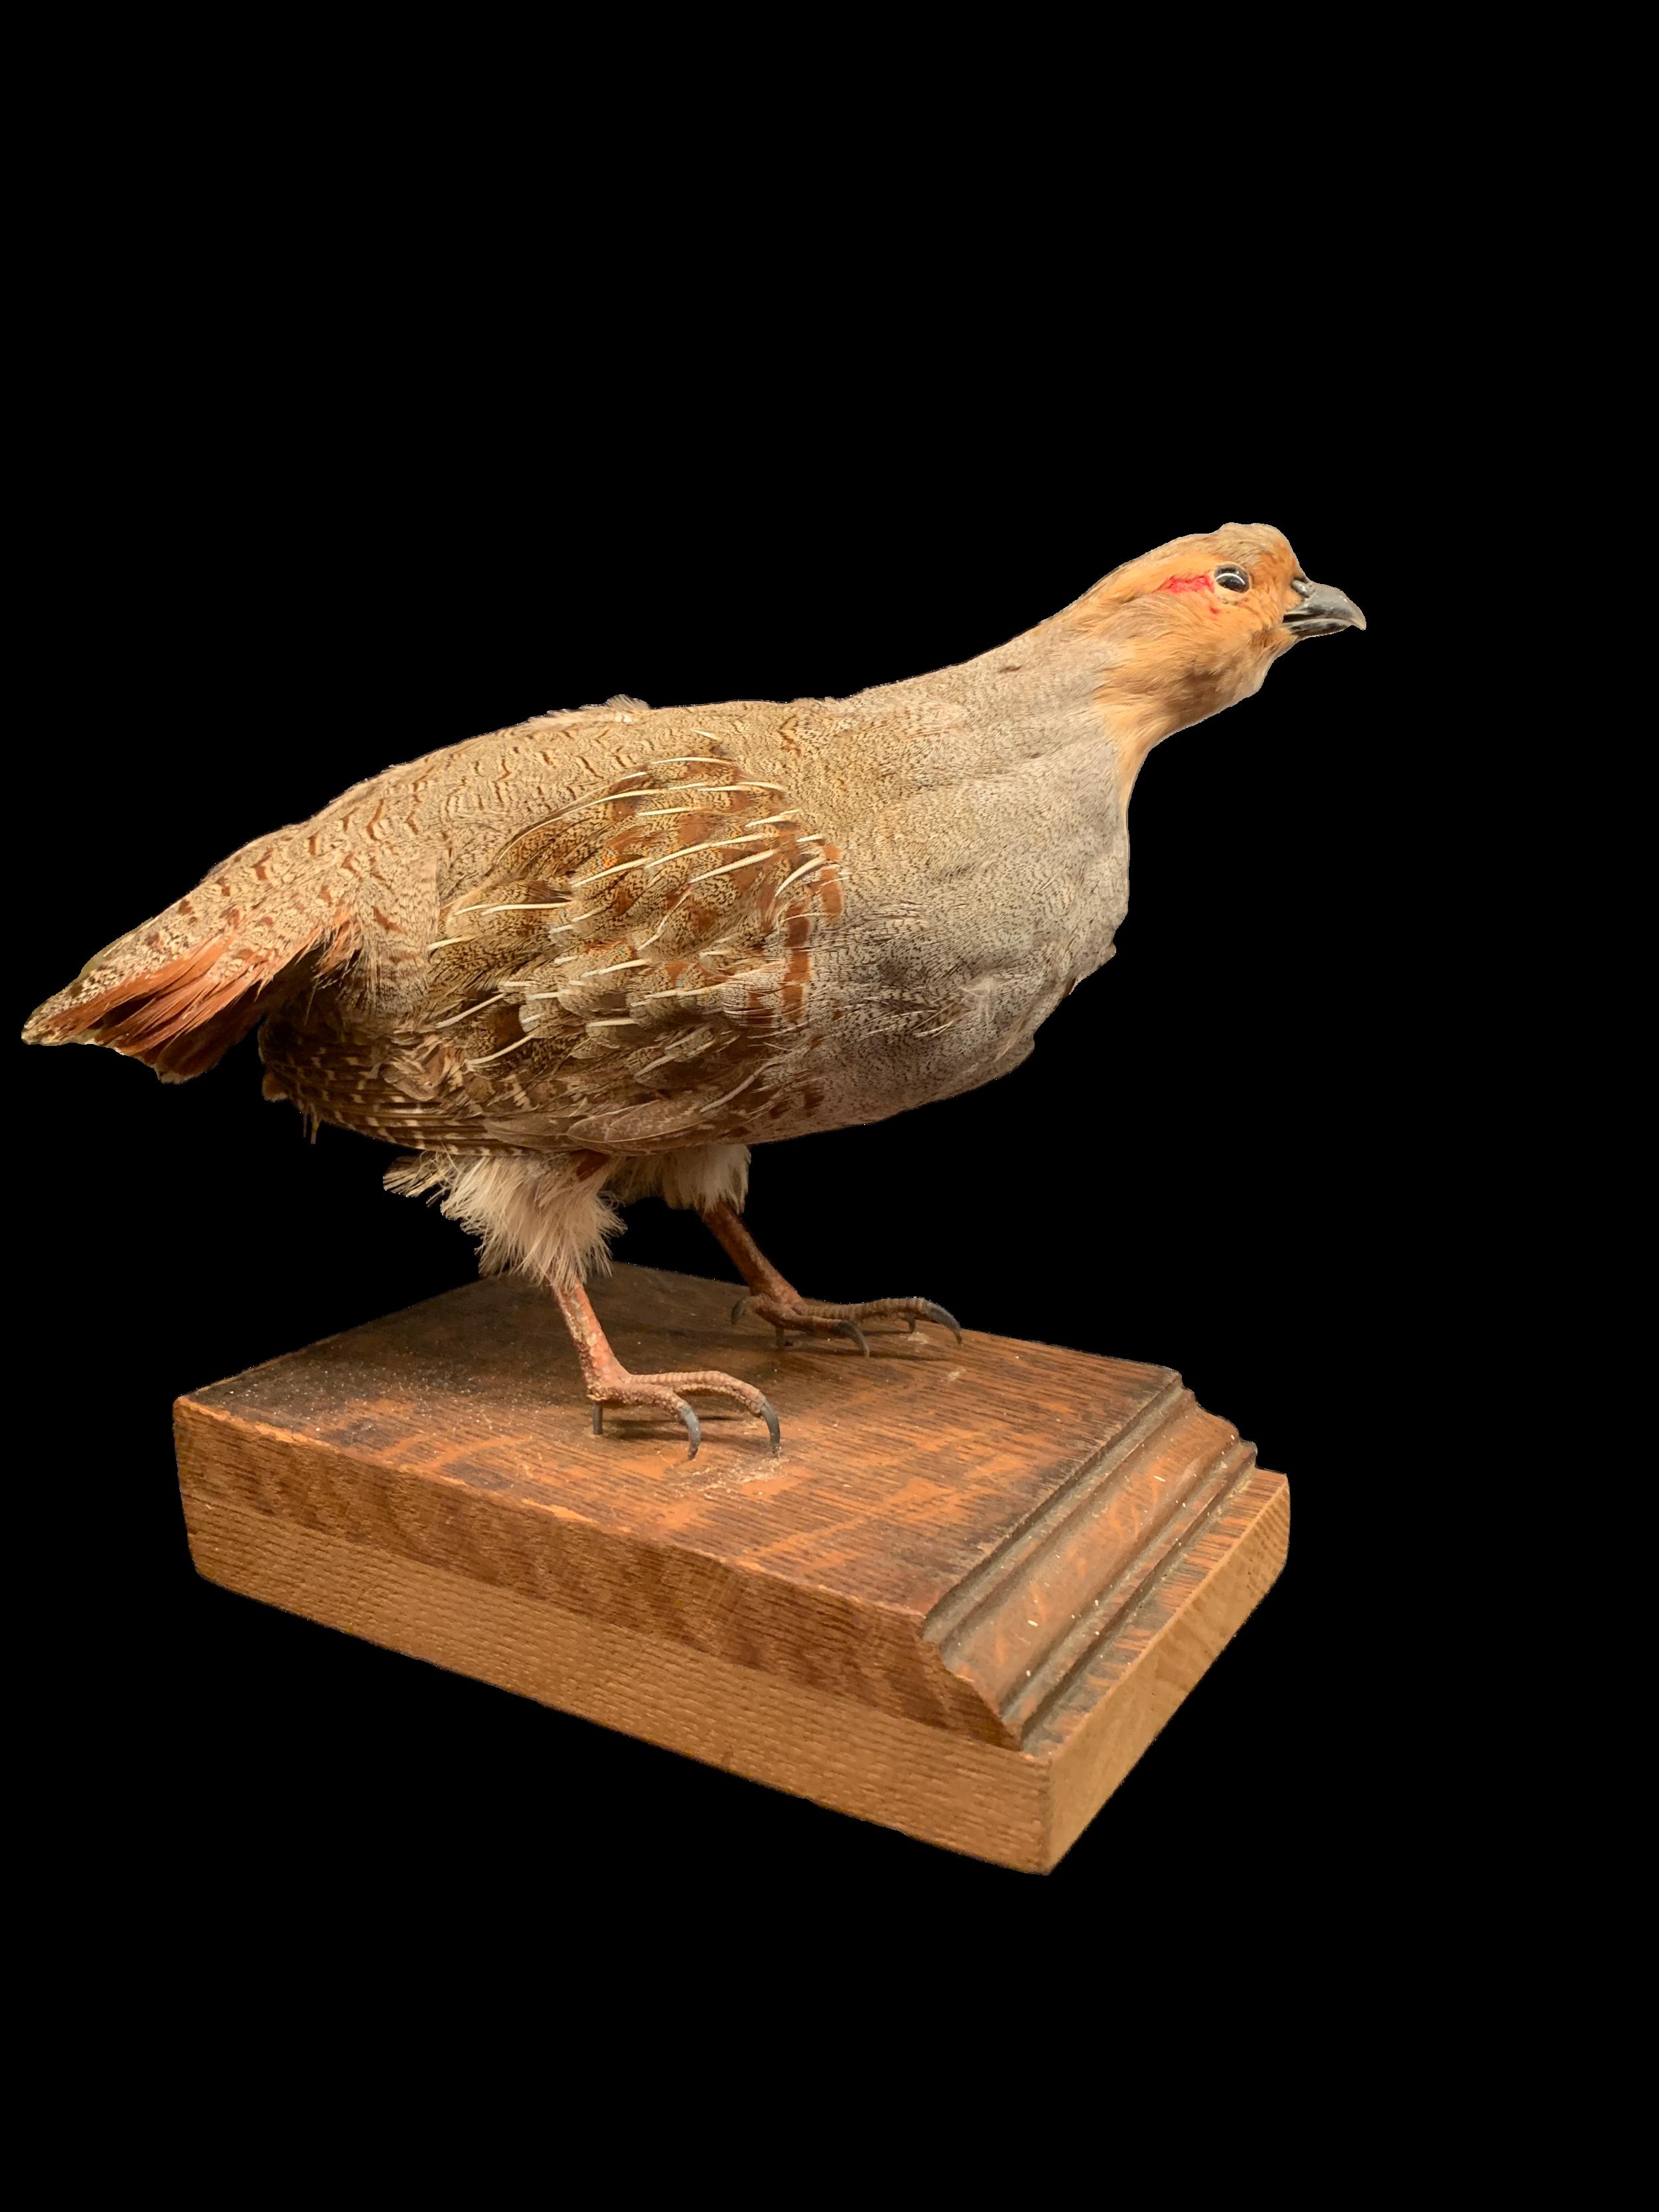 quail_web.png